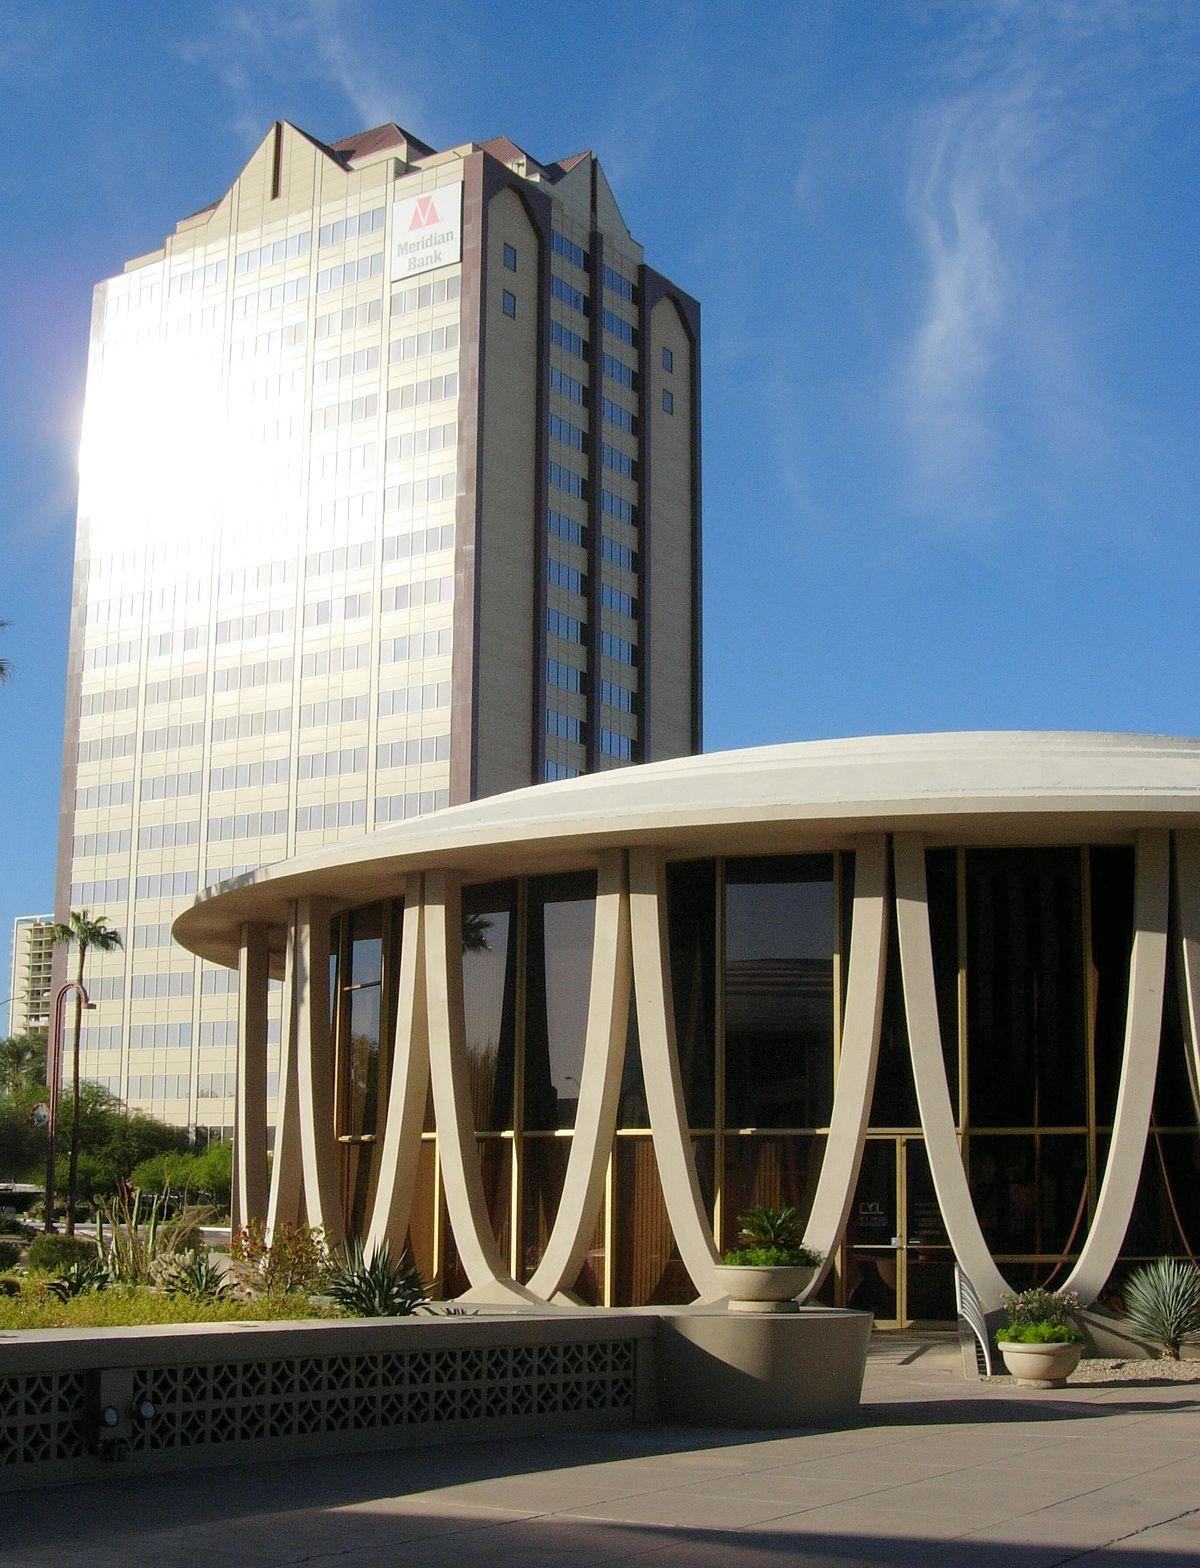 Meridian bank tower phoenix wikipedia for Banc meridienne